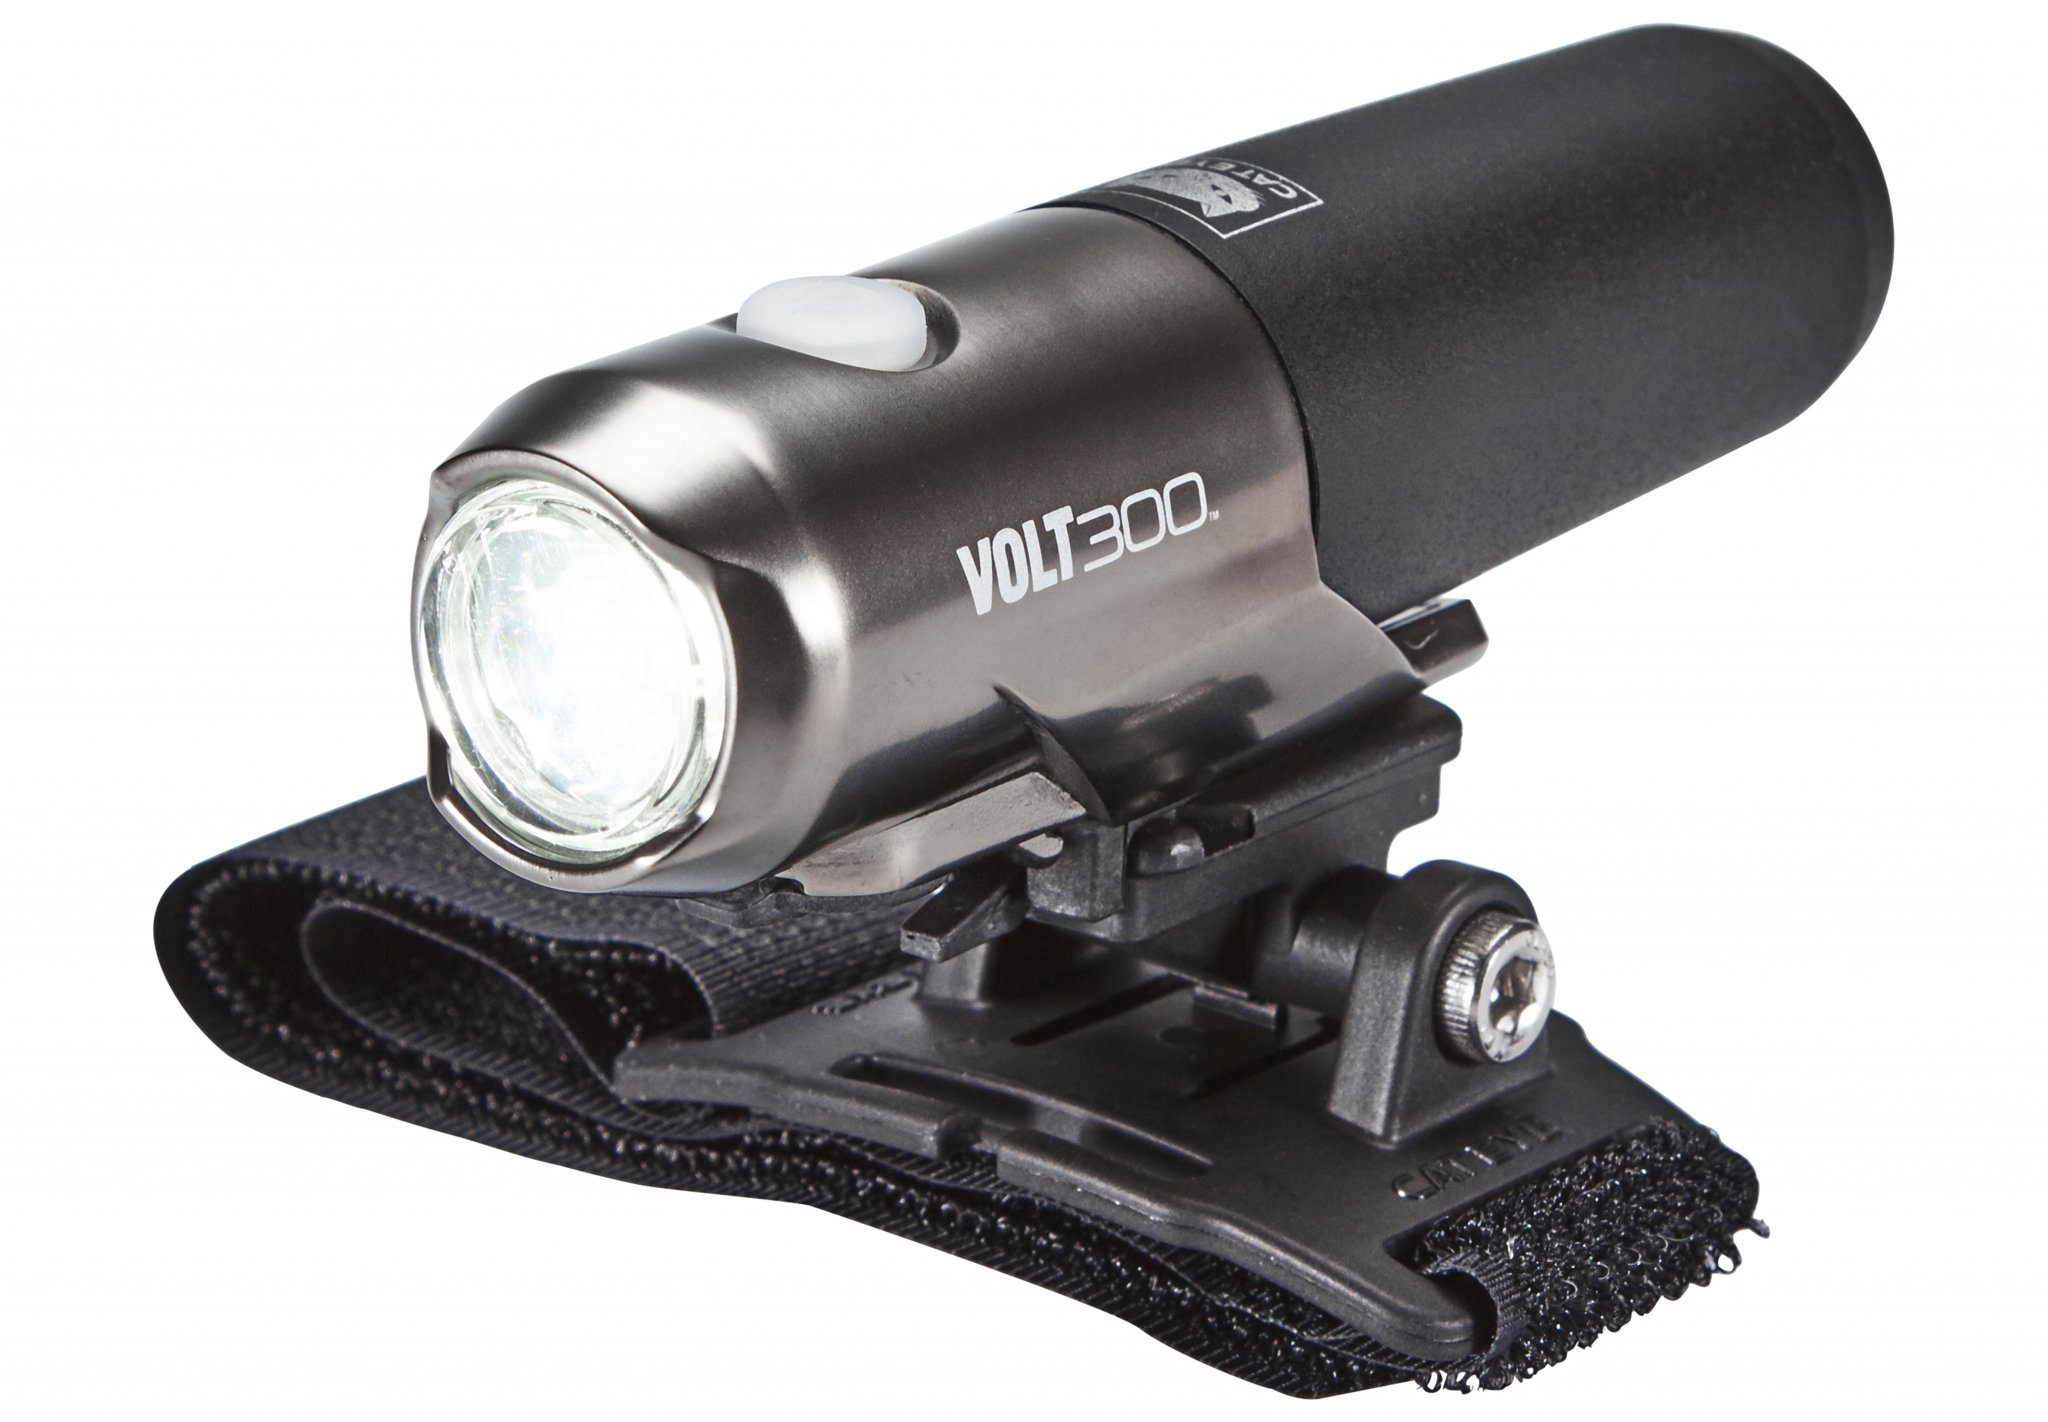 Cateye Fahrradbeleuchtung »Volt300 HL-EL460 RC Helmlampe«